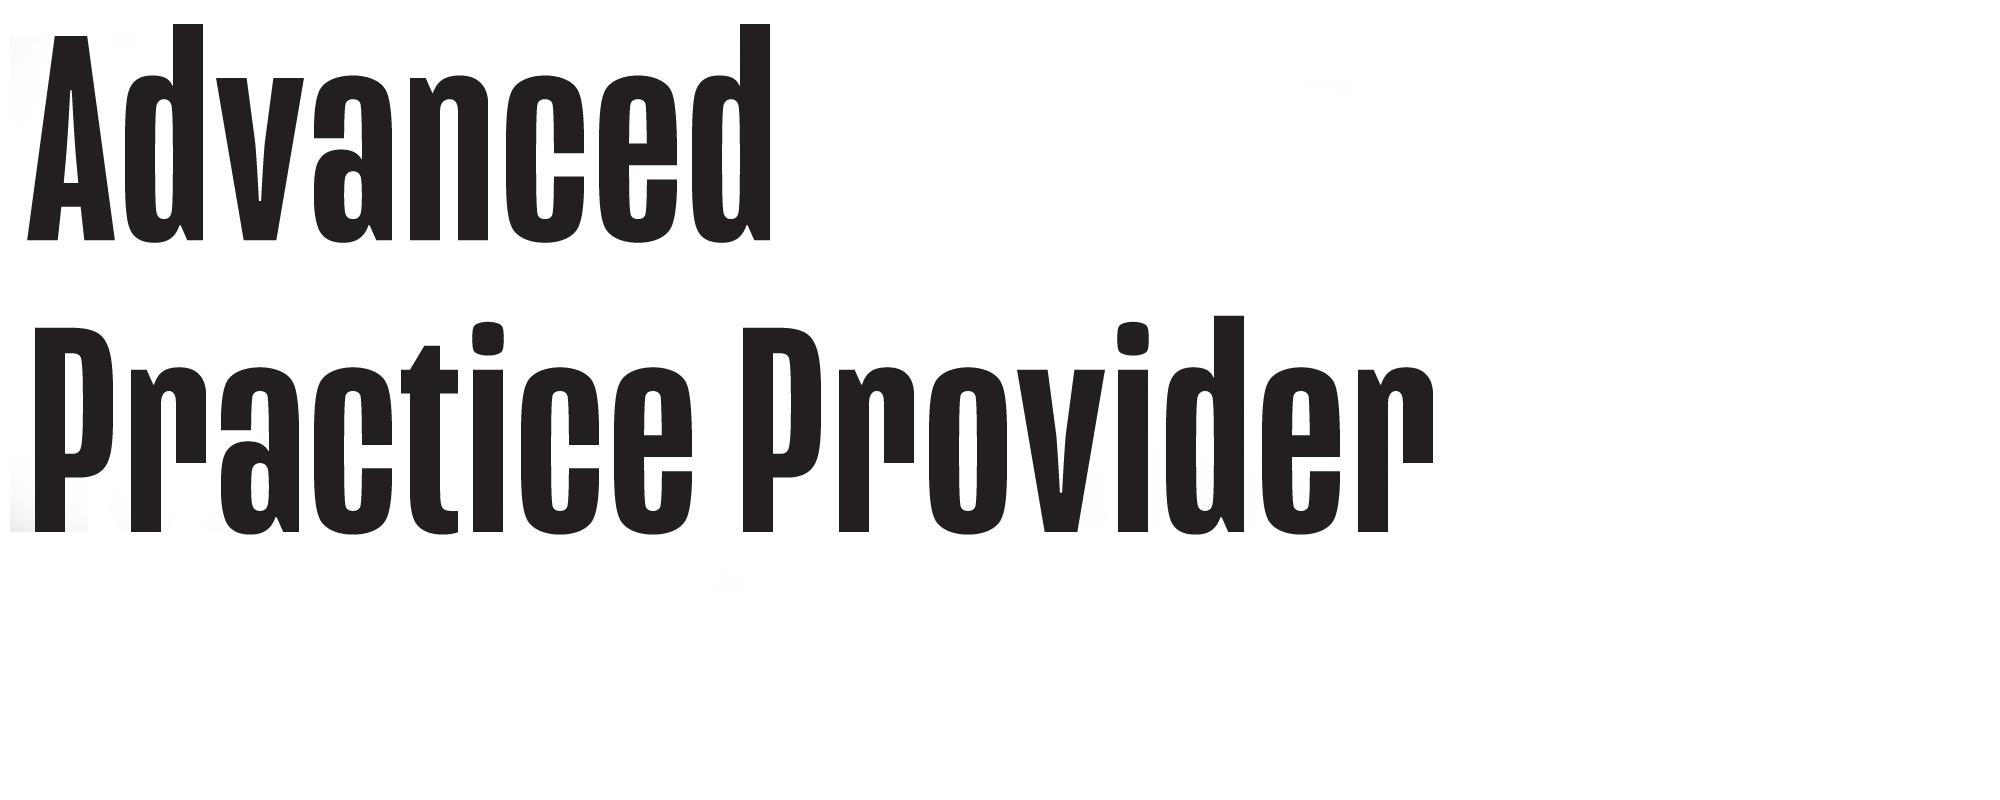 Advanced Practice Provider